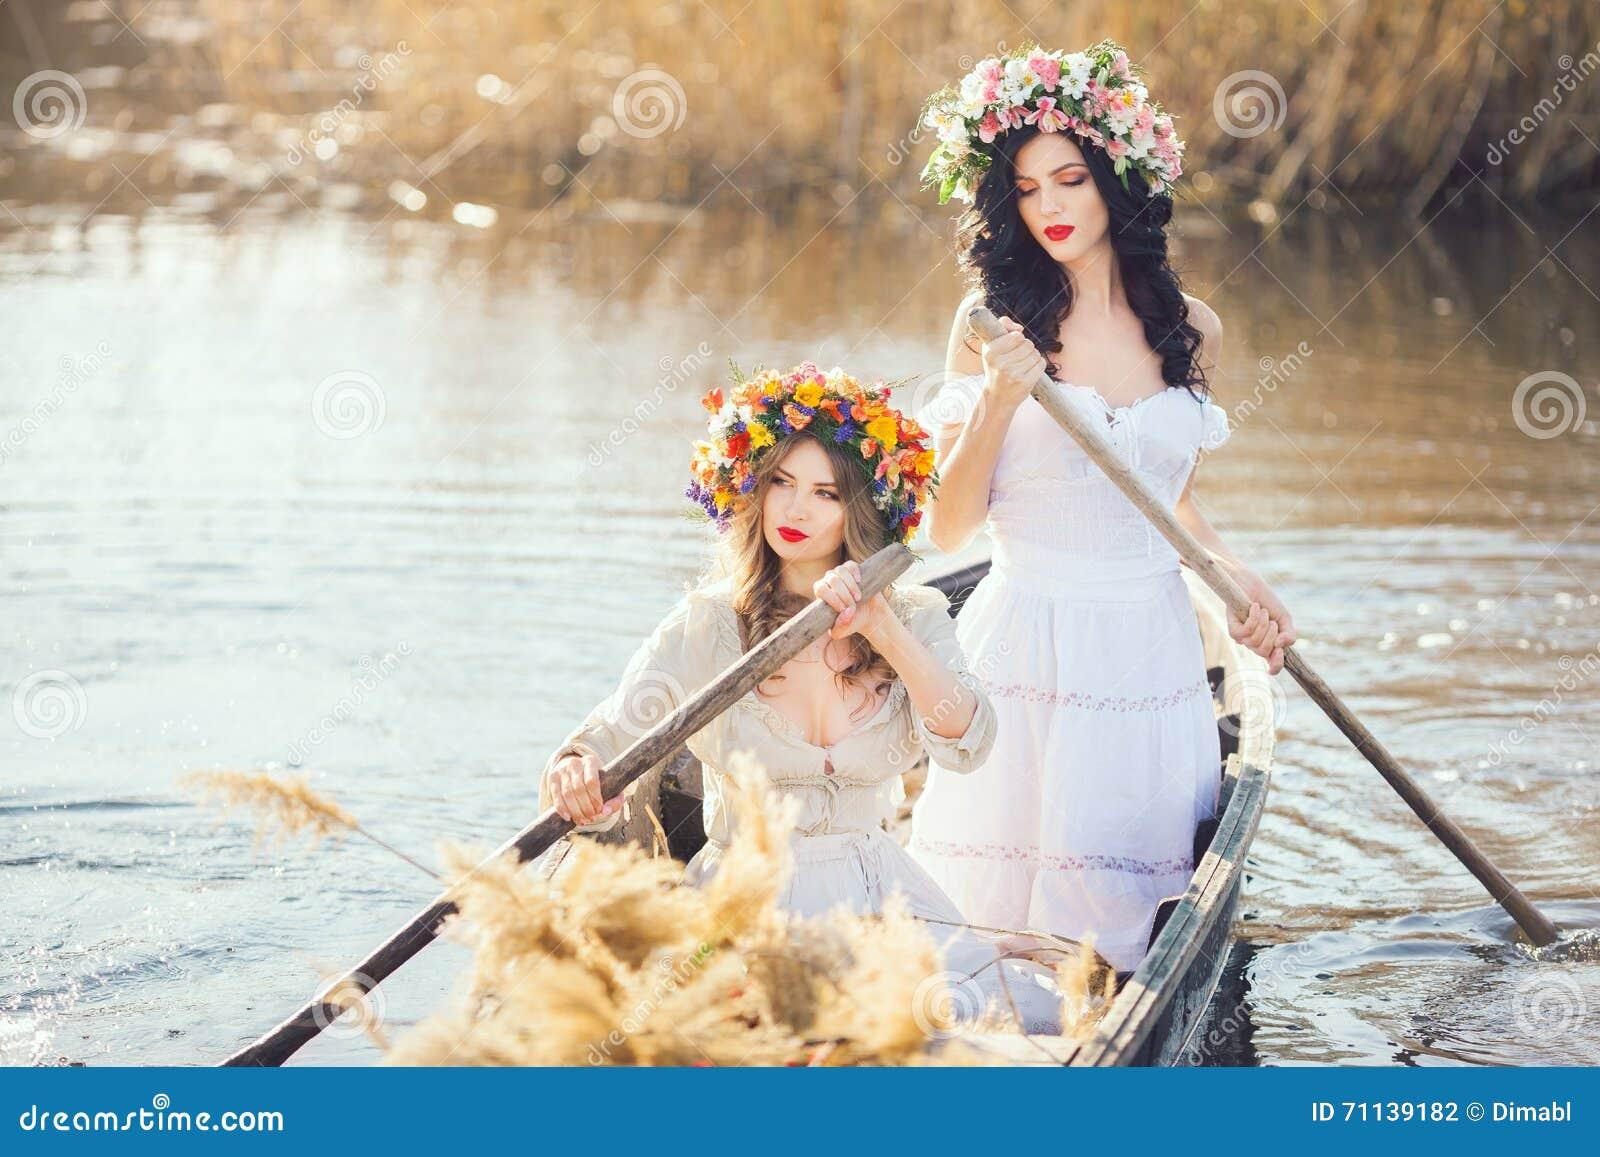 Fantasy art photo of a beautiful girls in boat